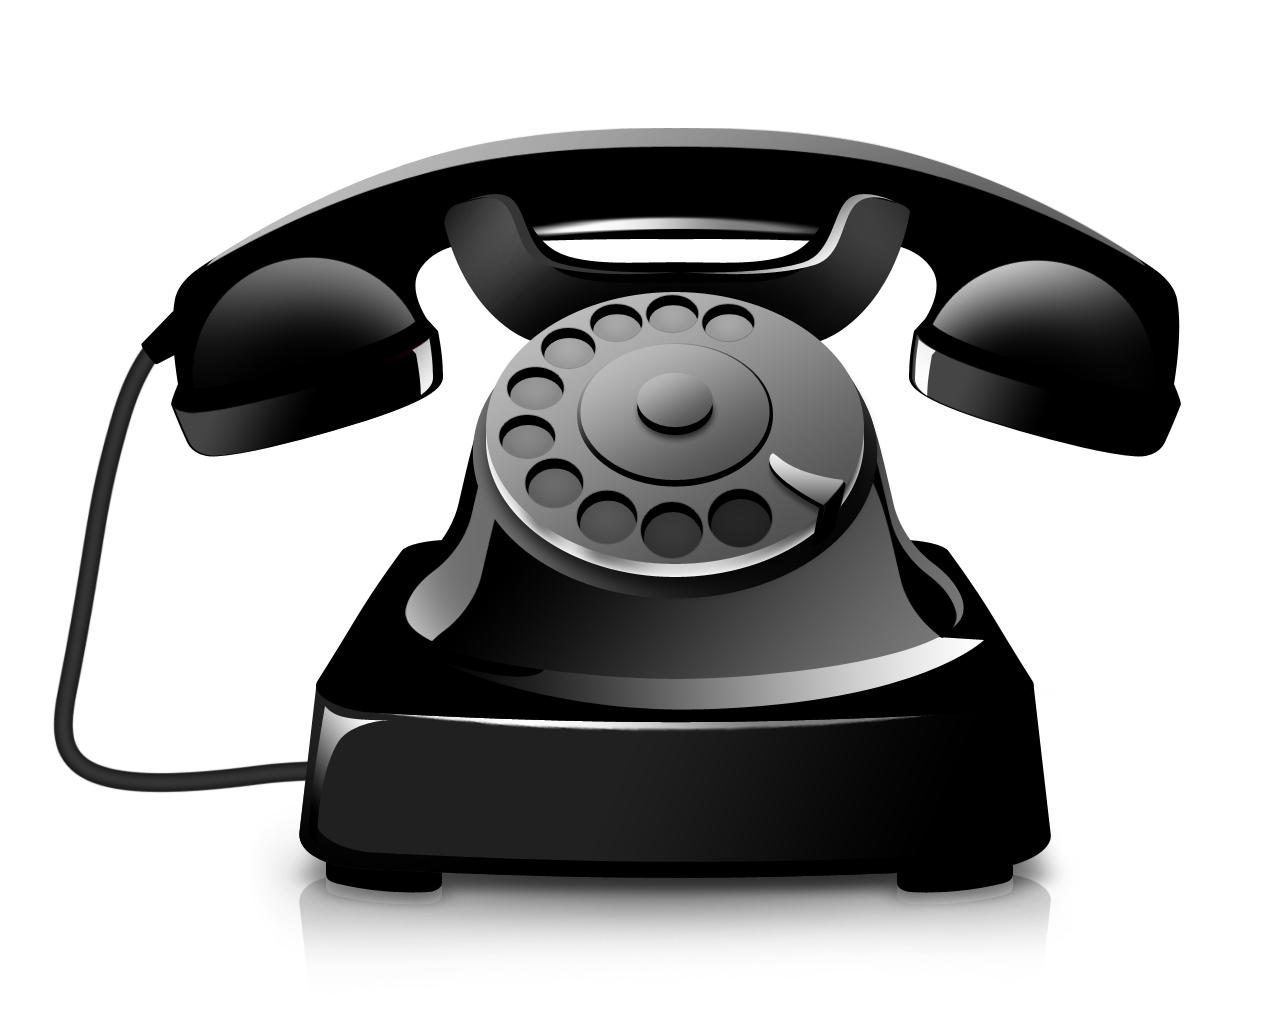 Clipart phone landline phone. Telephone clip art of